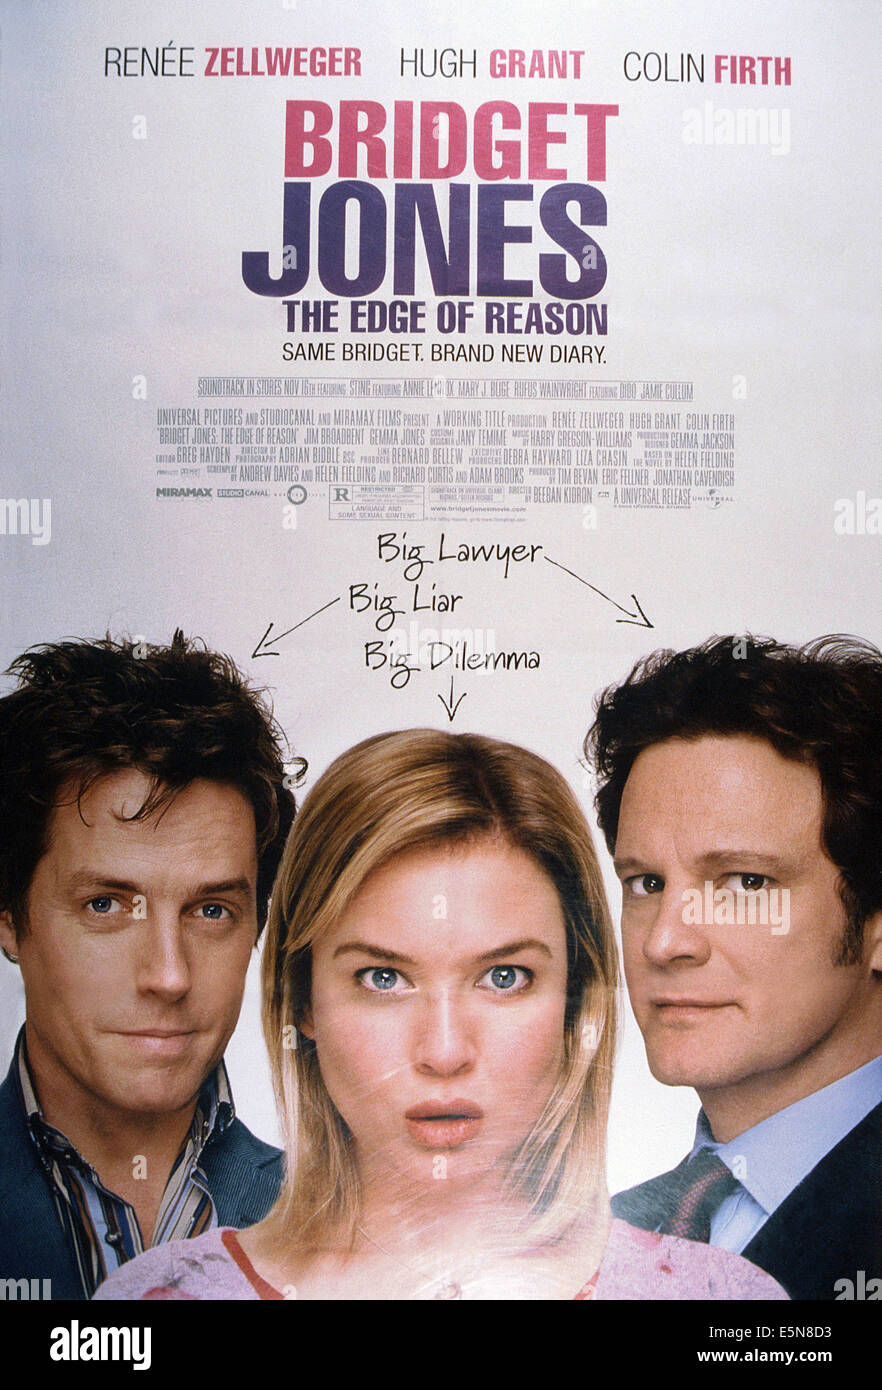 BRIDGET JONES: THE EDGE OF REASON, from left: Hugh Grant, Renee Zellweger, Colin Firth, 2004, © Universal/courtesy - Stock Image